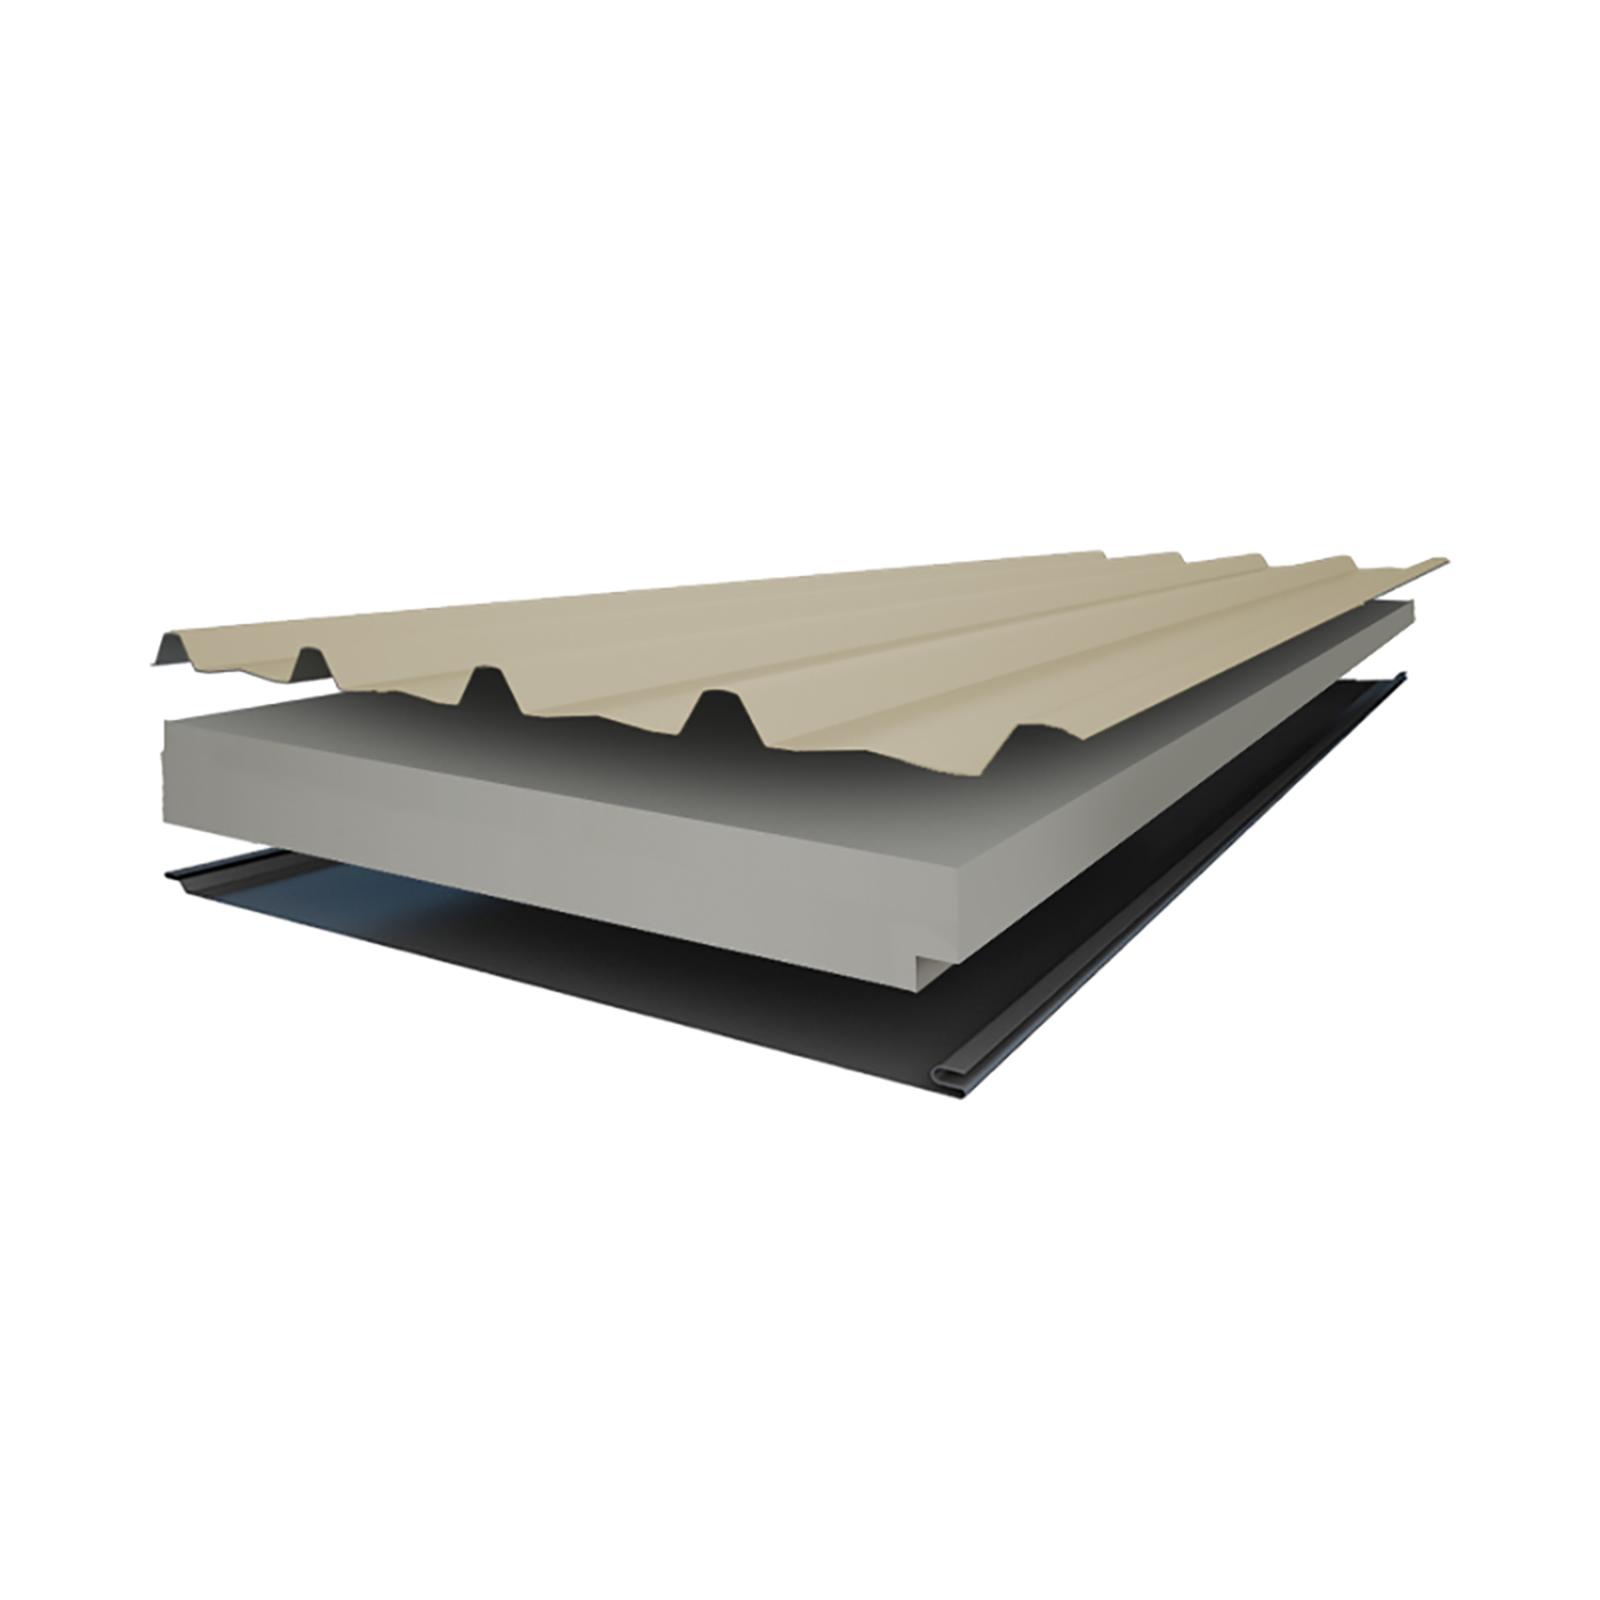 Insulspan 50mm Monospan Colorbond Roofing Panel